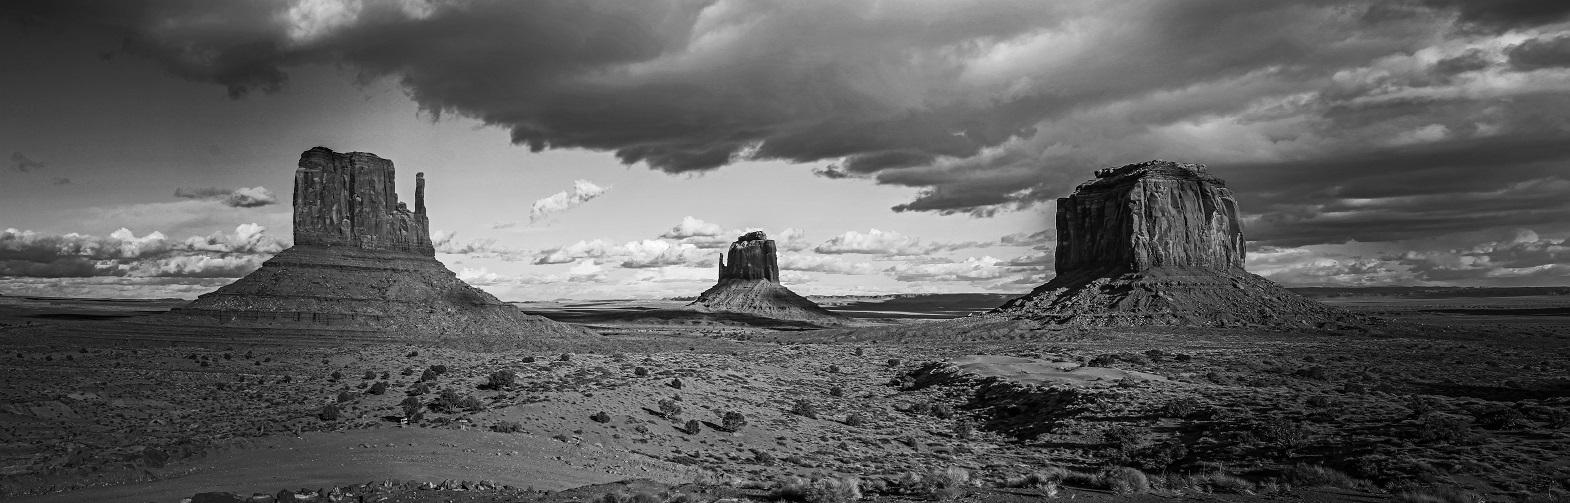 Monument Valley_edited.jpg